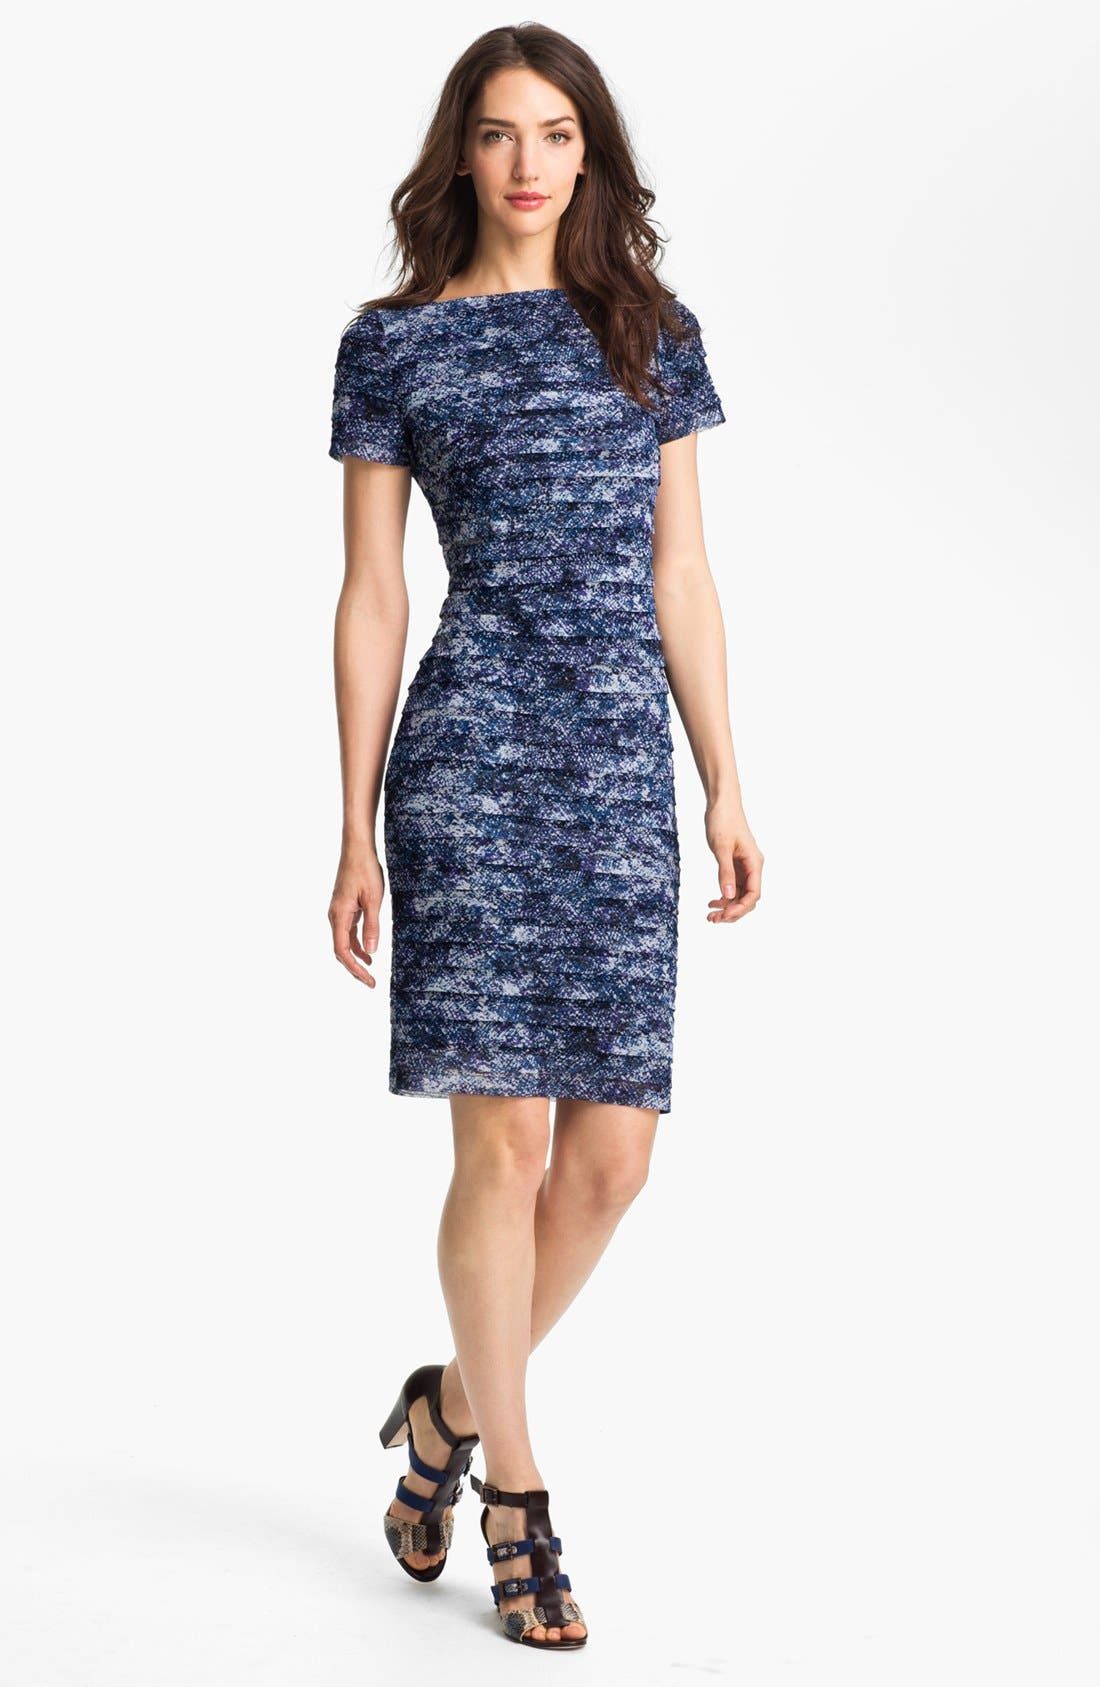 Alternate Image 1 Selected - Adrianna Papell Print Sheath Dress (Petite)